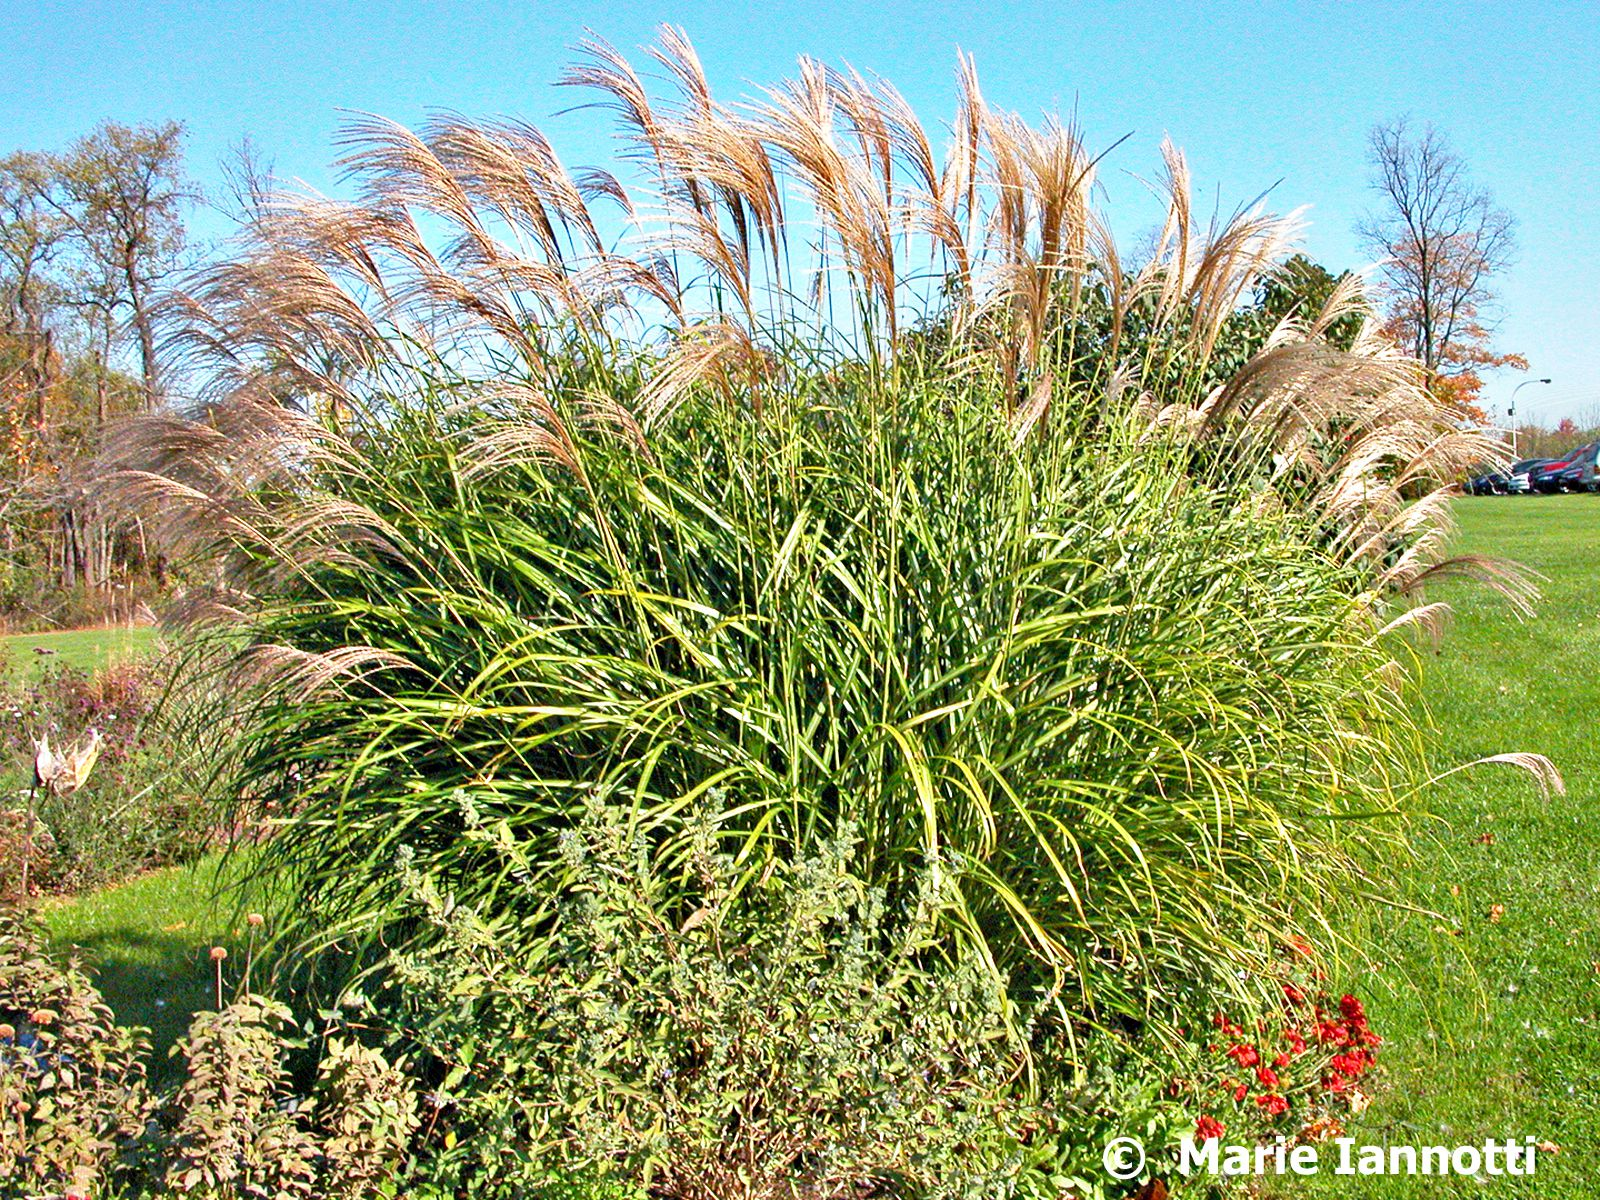 How to choose an ornamental grass for Ornamental grass design